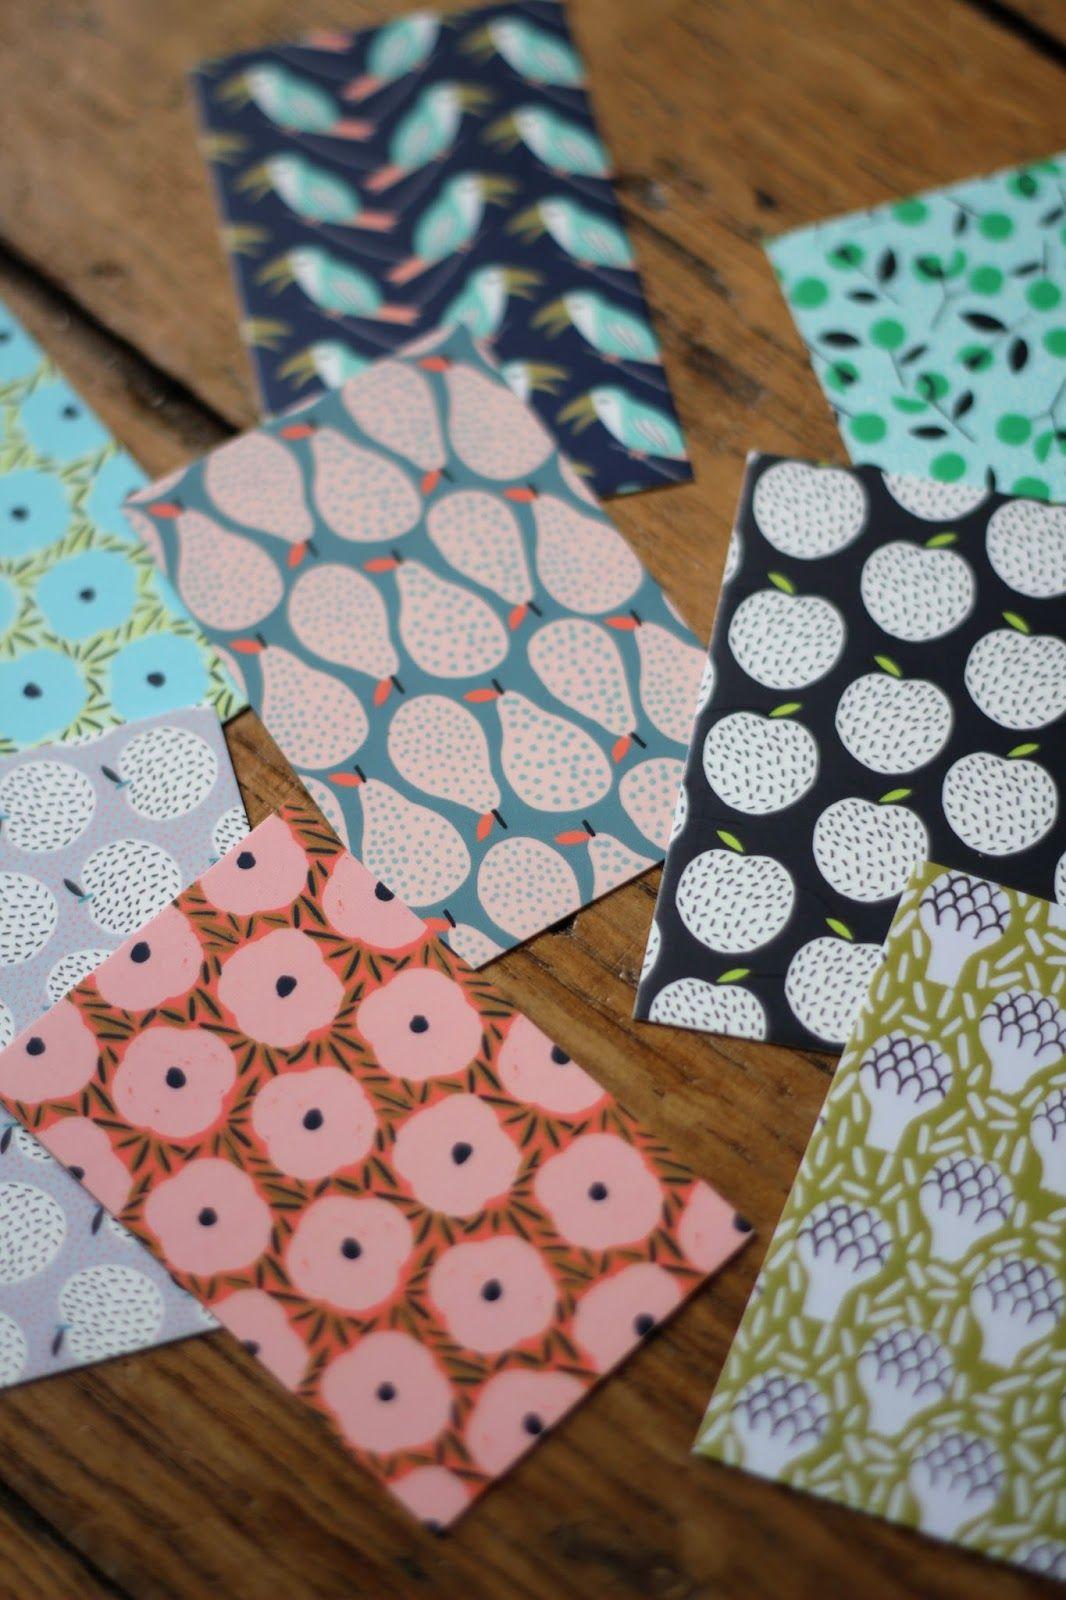 Flore Larrazet Textile Designer Surface Pattern Illustrator Mes Cartes De Visite Sont Arrivees